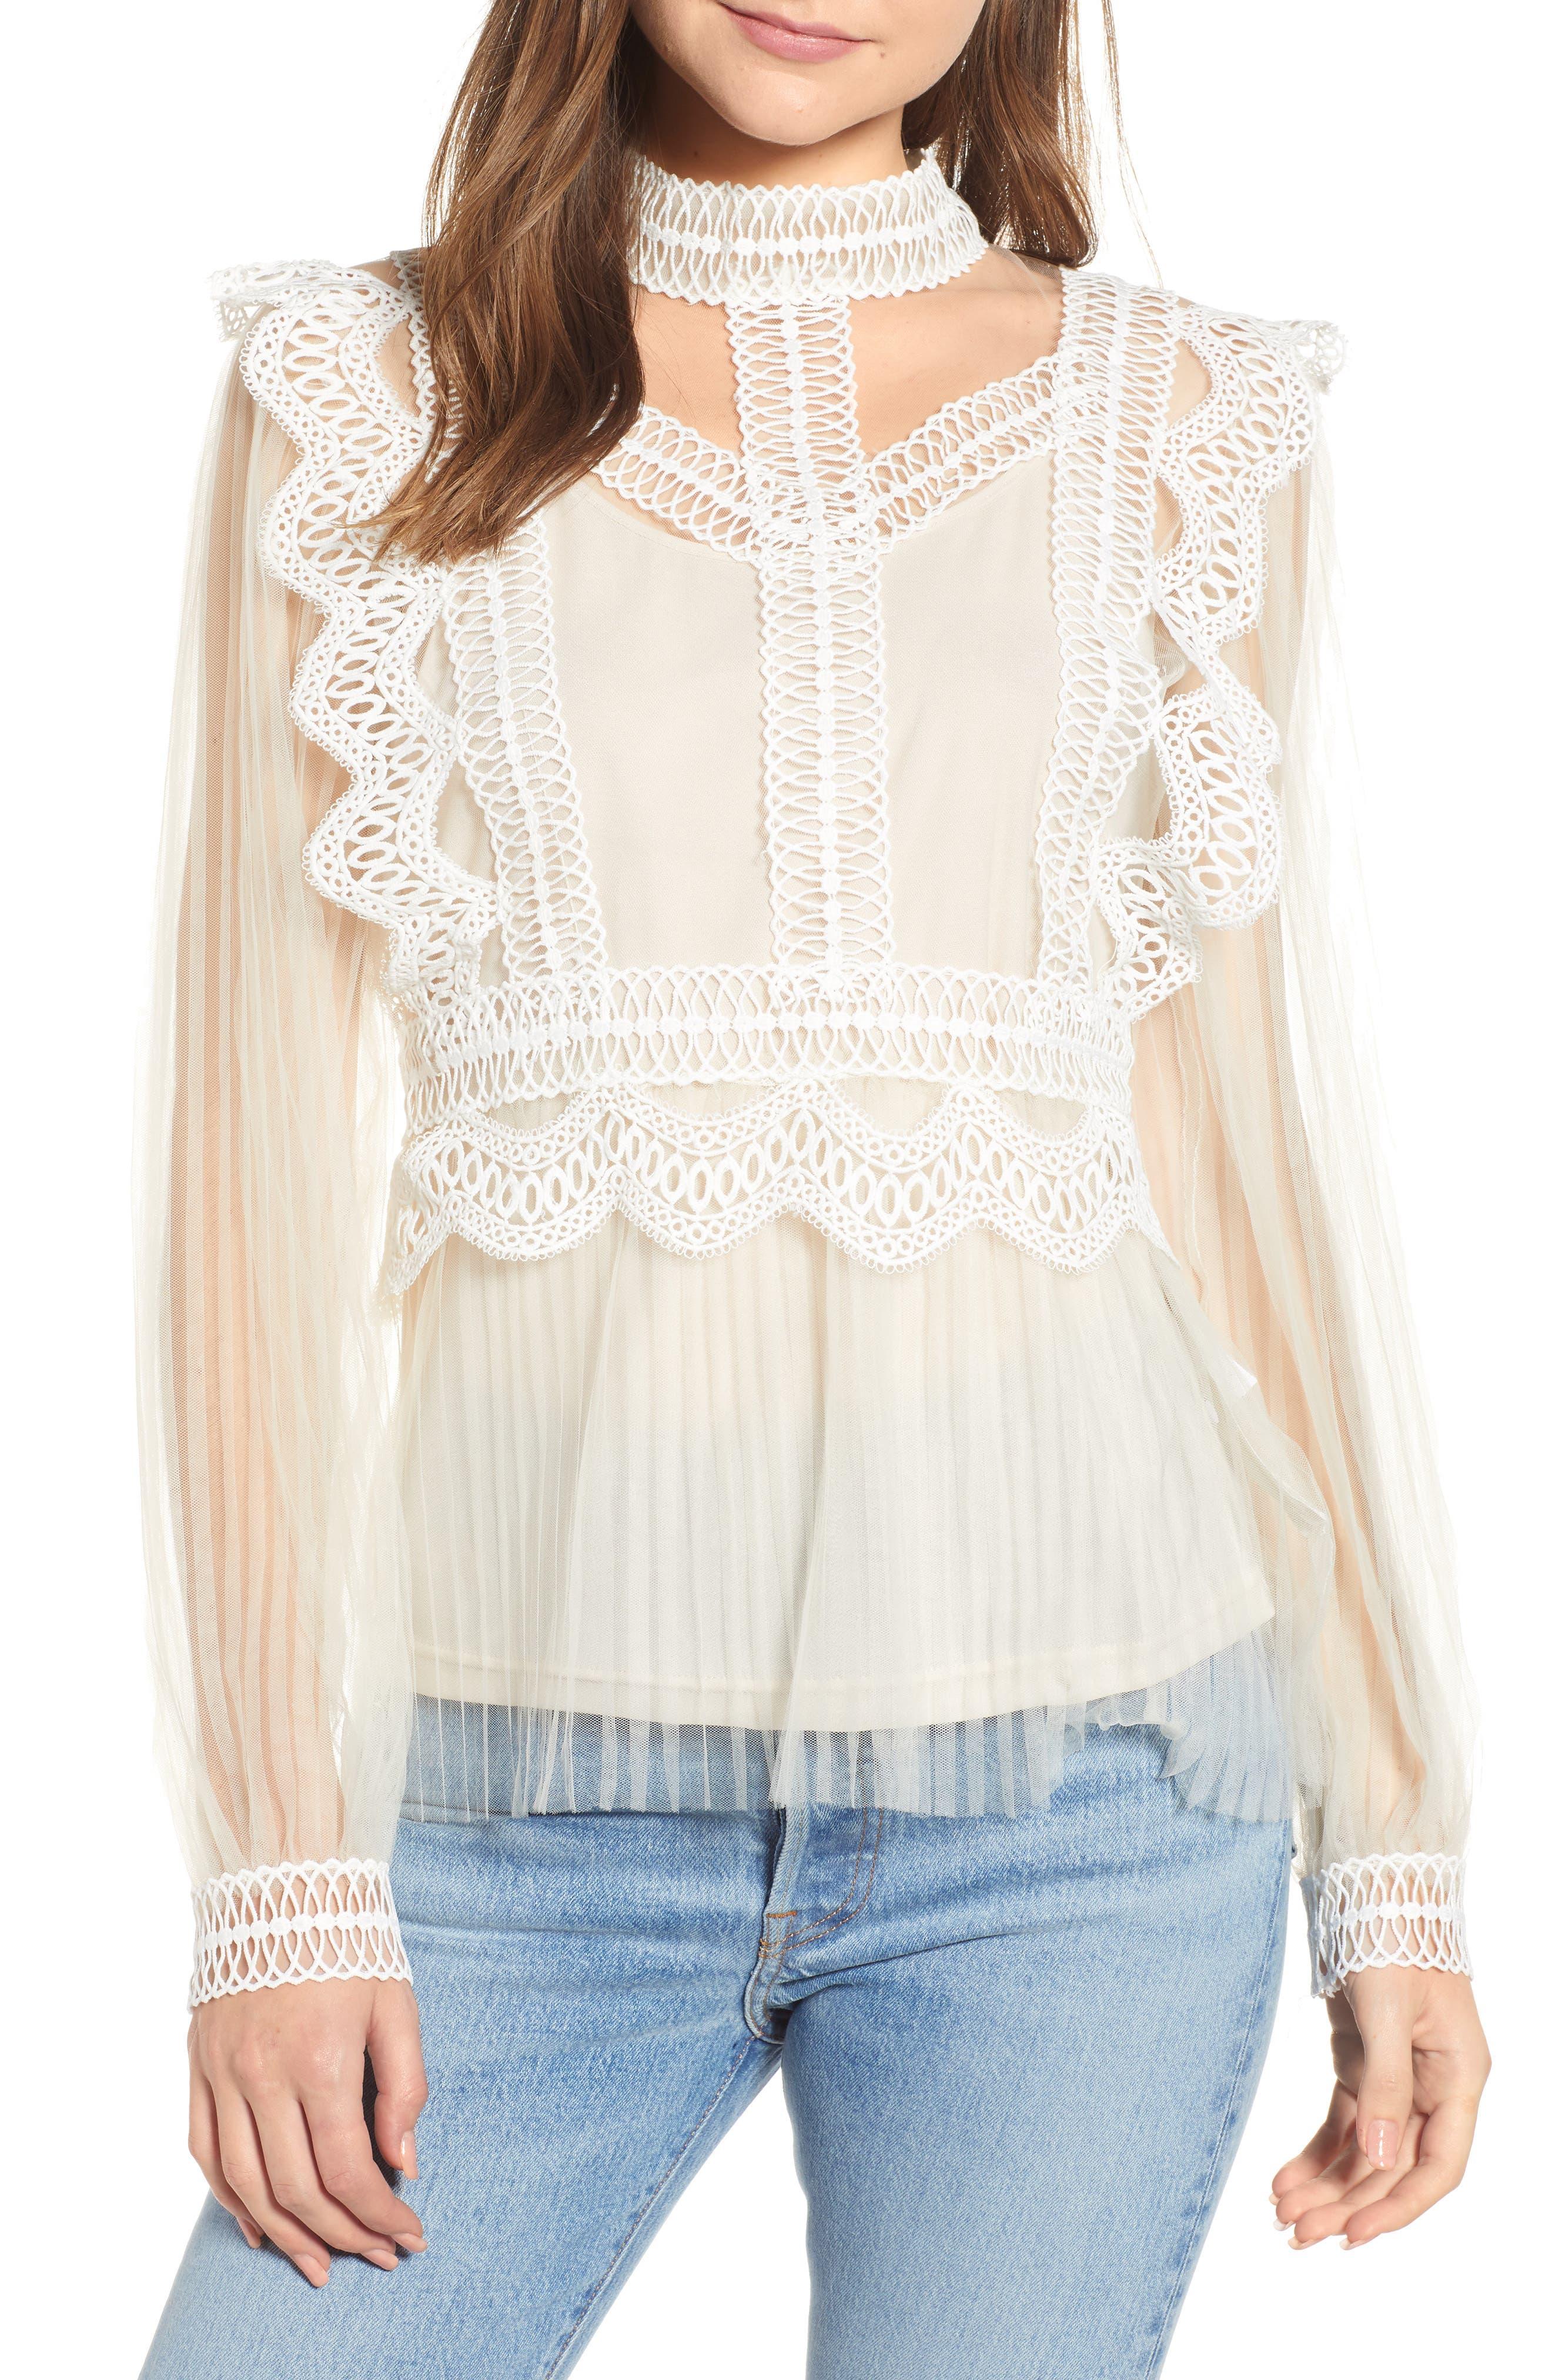 Edwardian Blouses | White & Black Lace Blouses & Sweaters Womens Endless Rose Lace Detail Mesh Blouse $110.00 AT vintagedancer.com